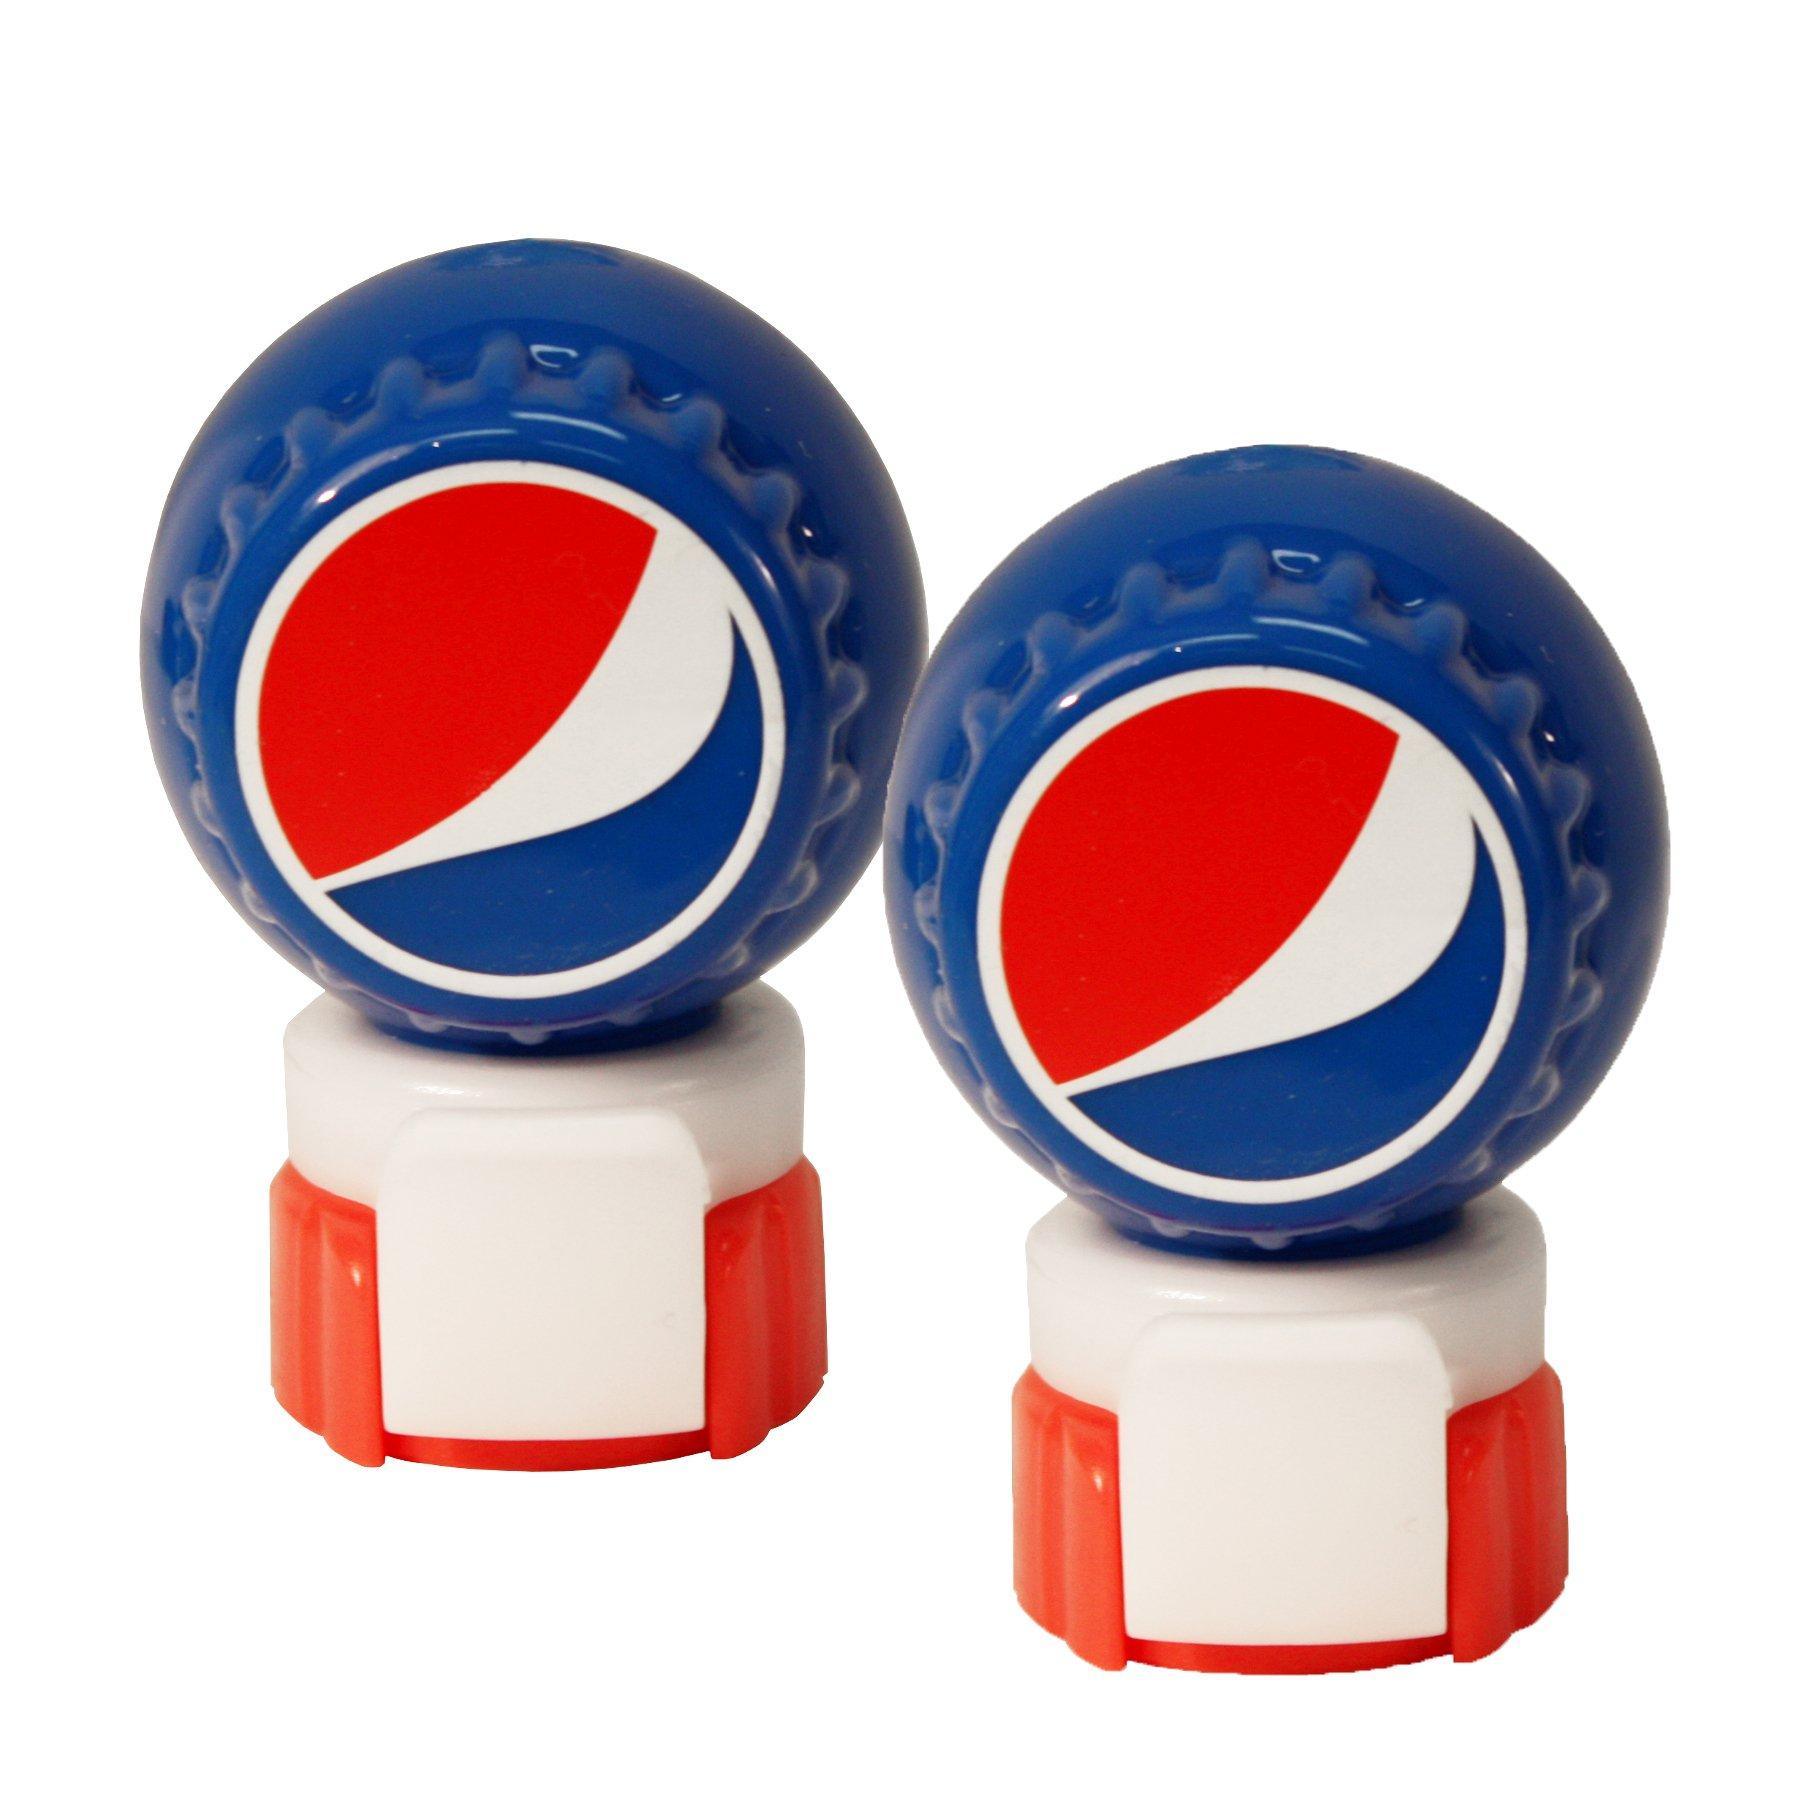 Jokari 2 Count Pepsi Modern Logo Fizz Keeper Soda Bottle Pump and Pour, Red/White/Blue